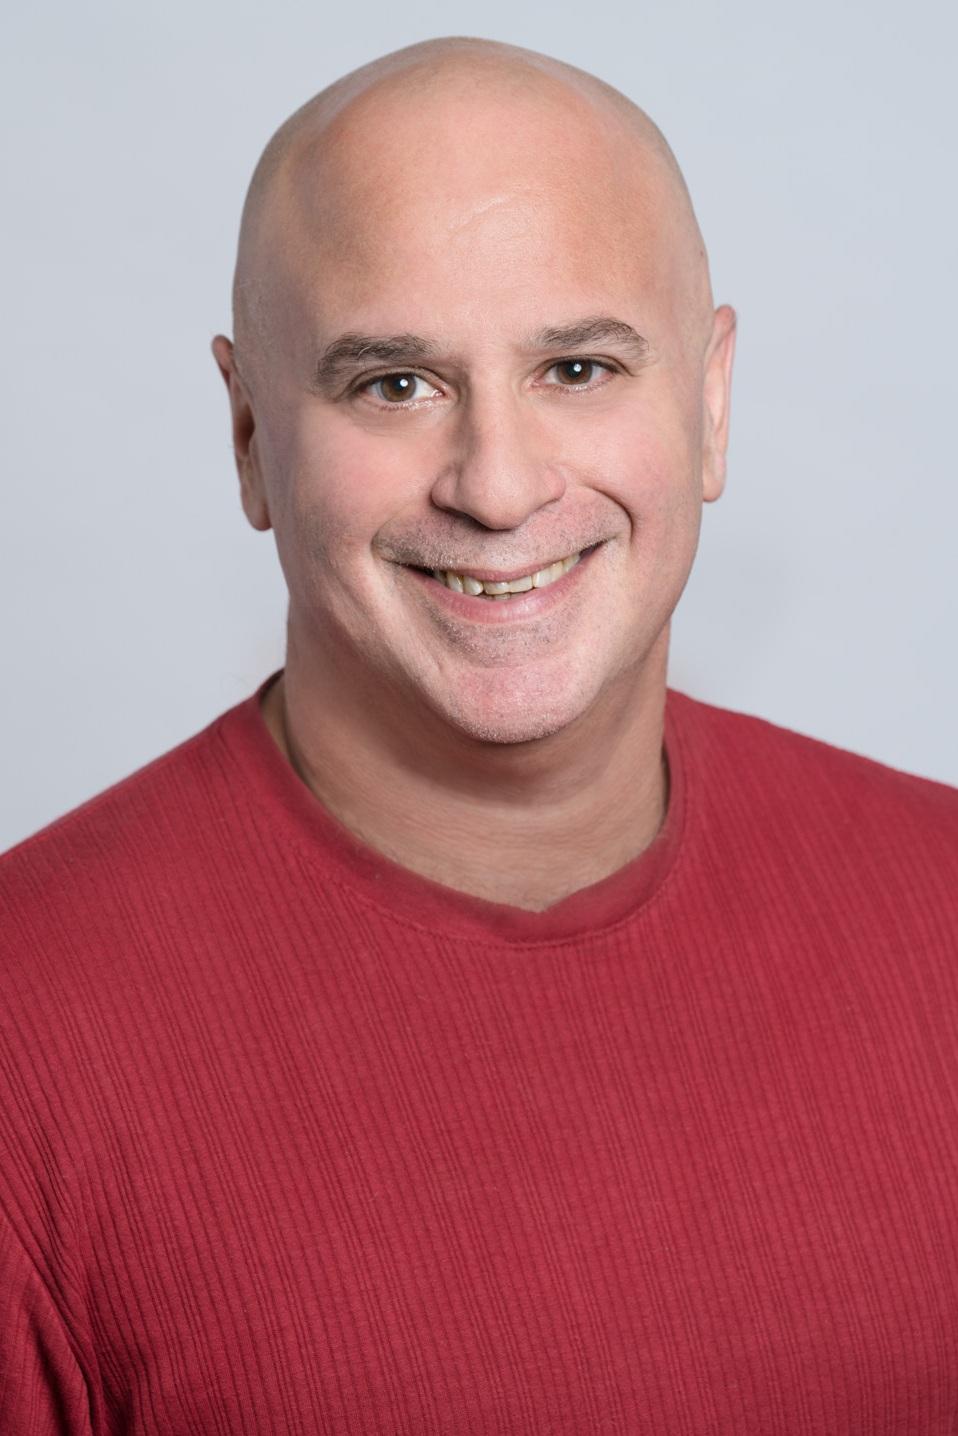 Daniel Levin - ASSOCIATE CLINICAL PROFESSOR, TEACHING & LEARNING, POLICY & LEADERSHIPdlevin2@umd.edu